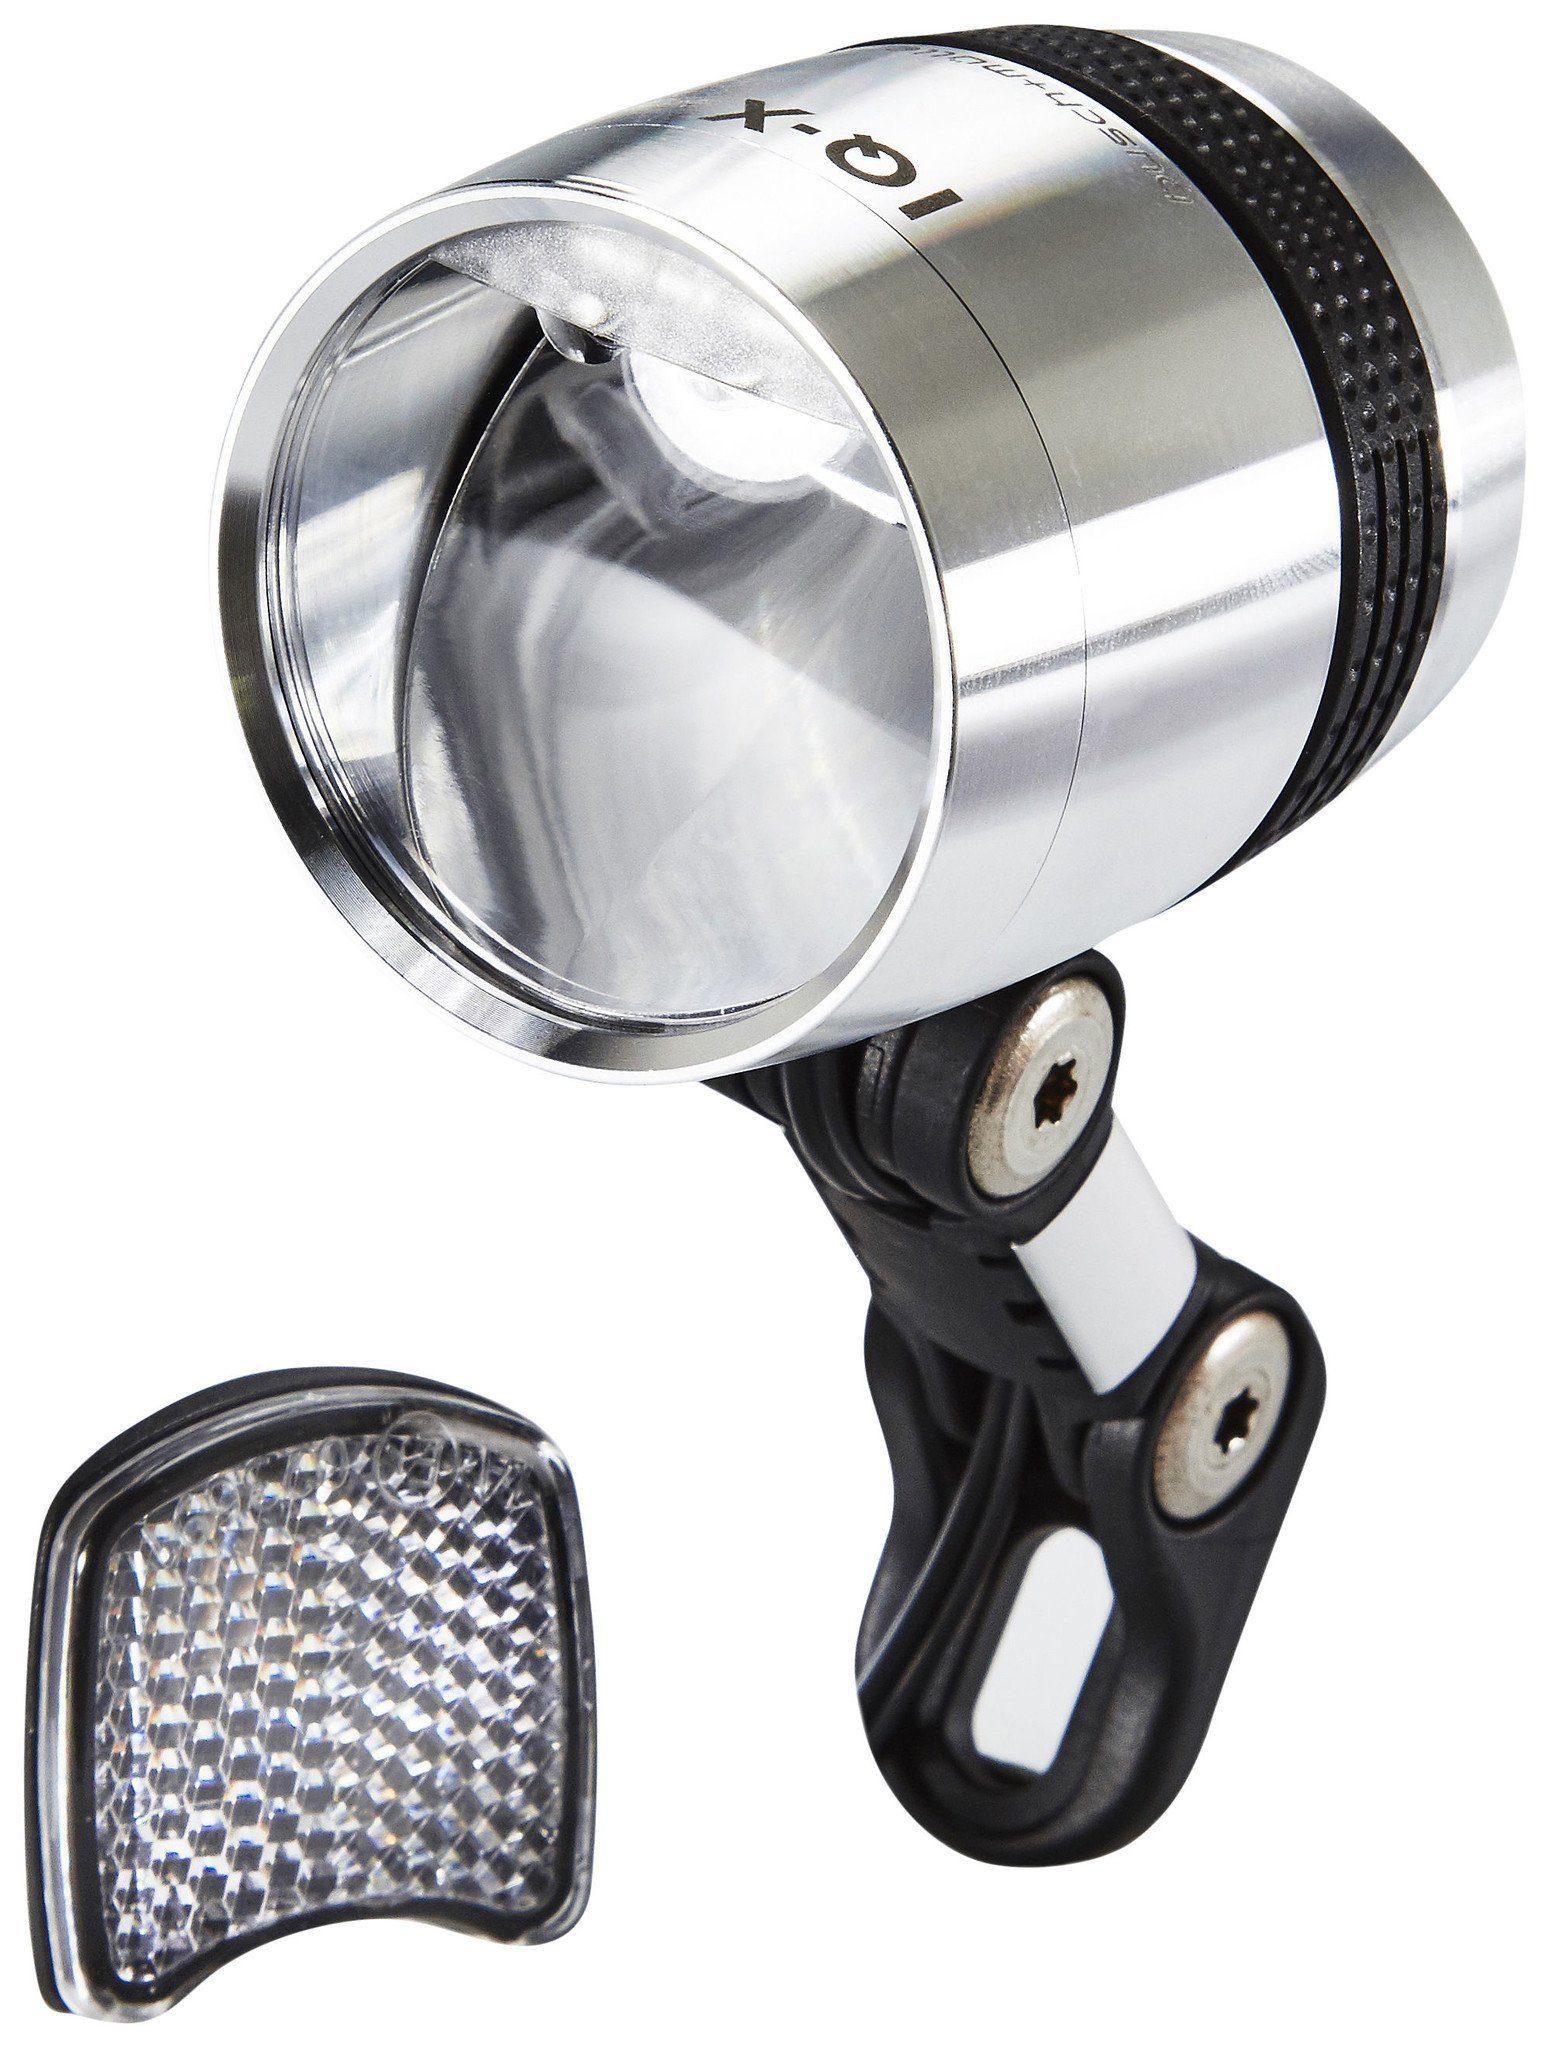 Busch + Müller Fahrradbeleuchtung »Lumotec IQ-X Dynamo-Frontscheinwerfer LED«